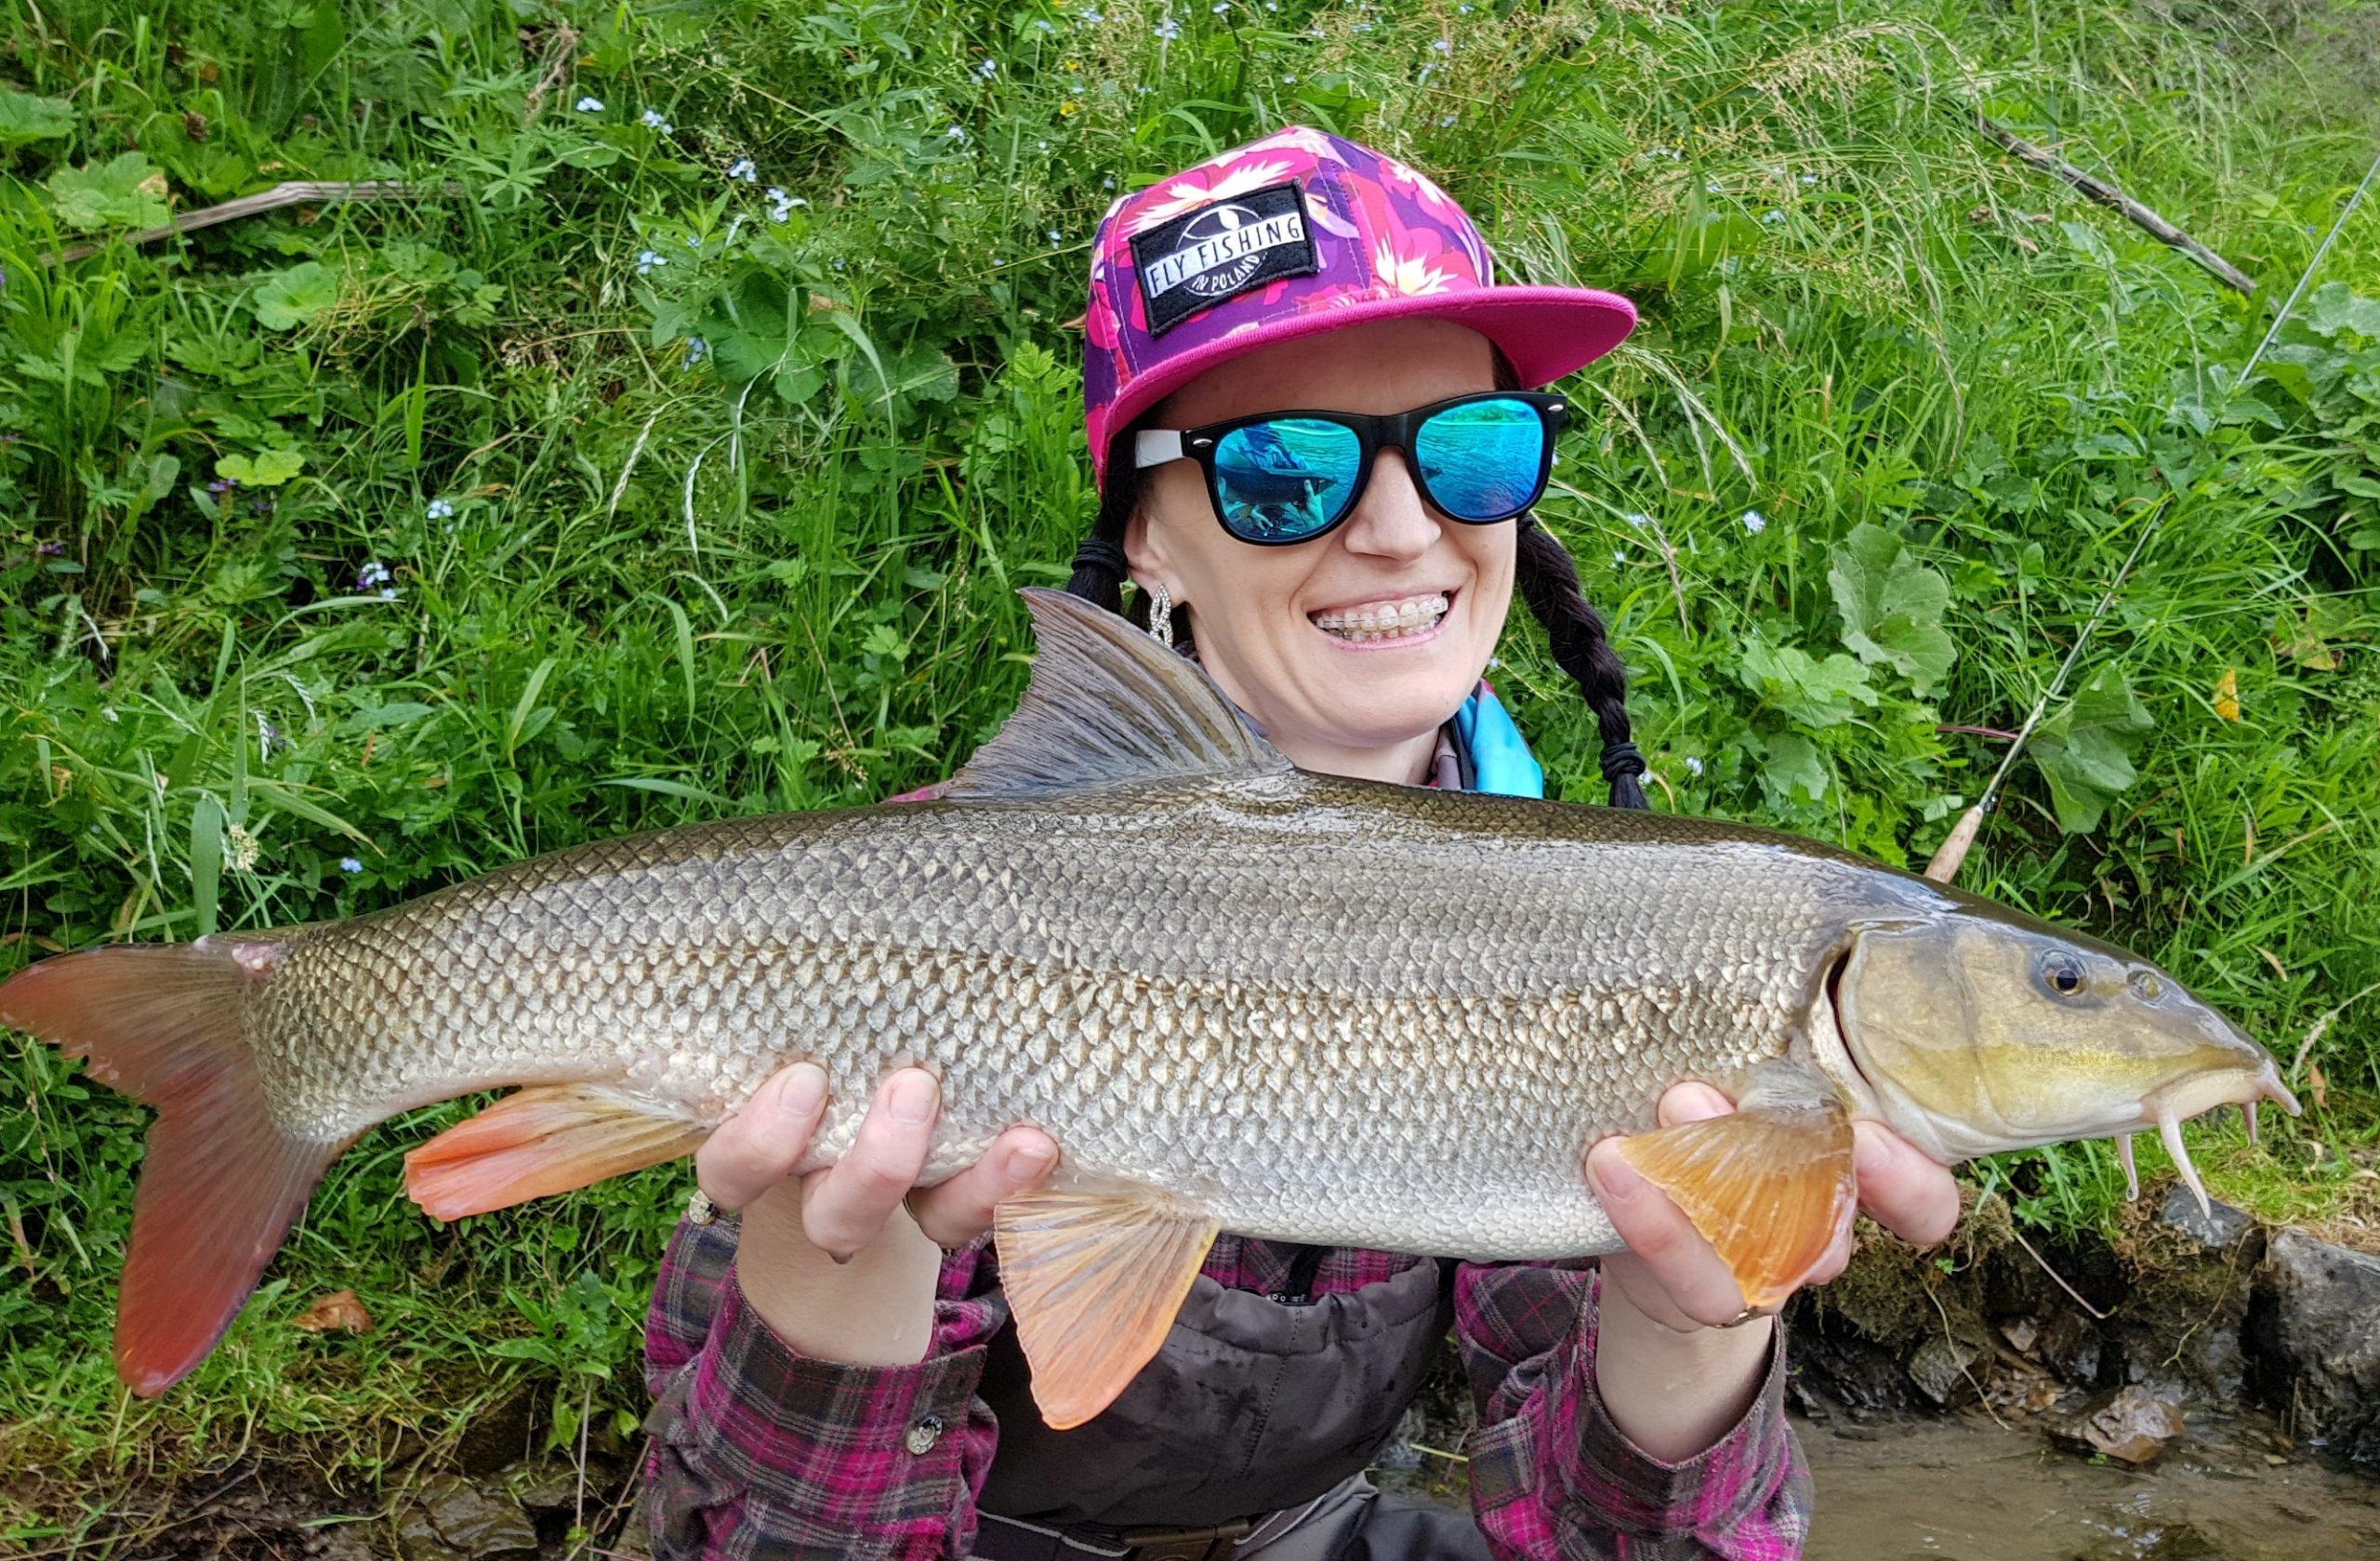 Girl fly fishing - Patagonia shirt brings luck